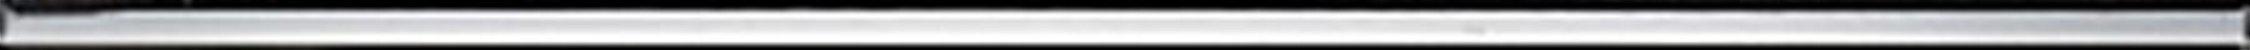 DUNE STRIP PLATINO - Imagem 1